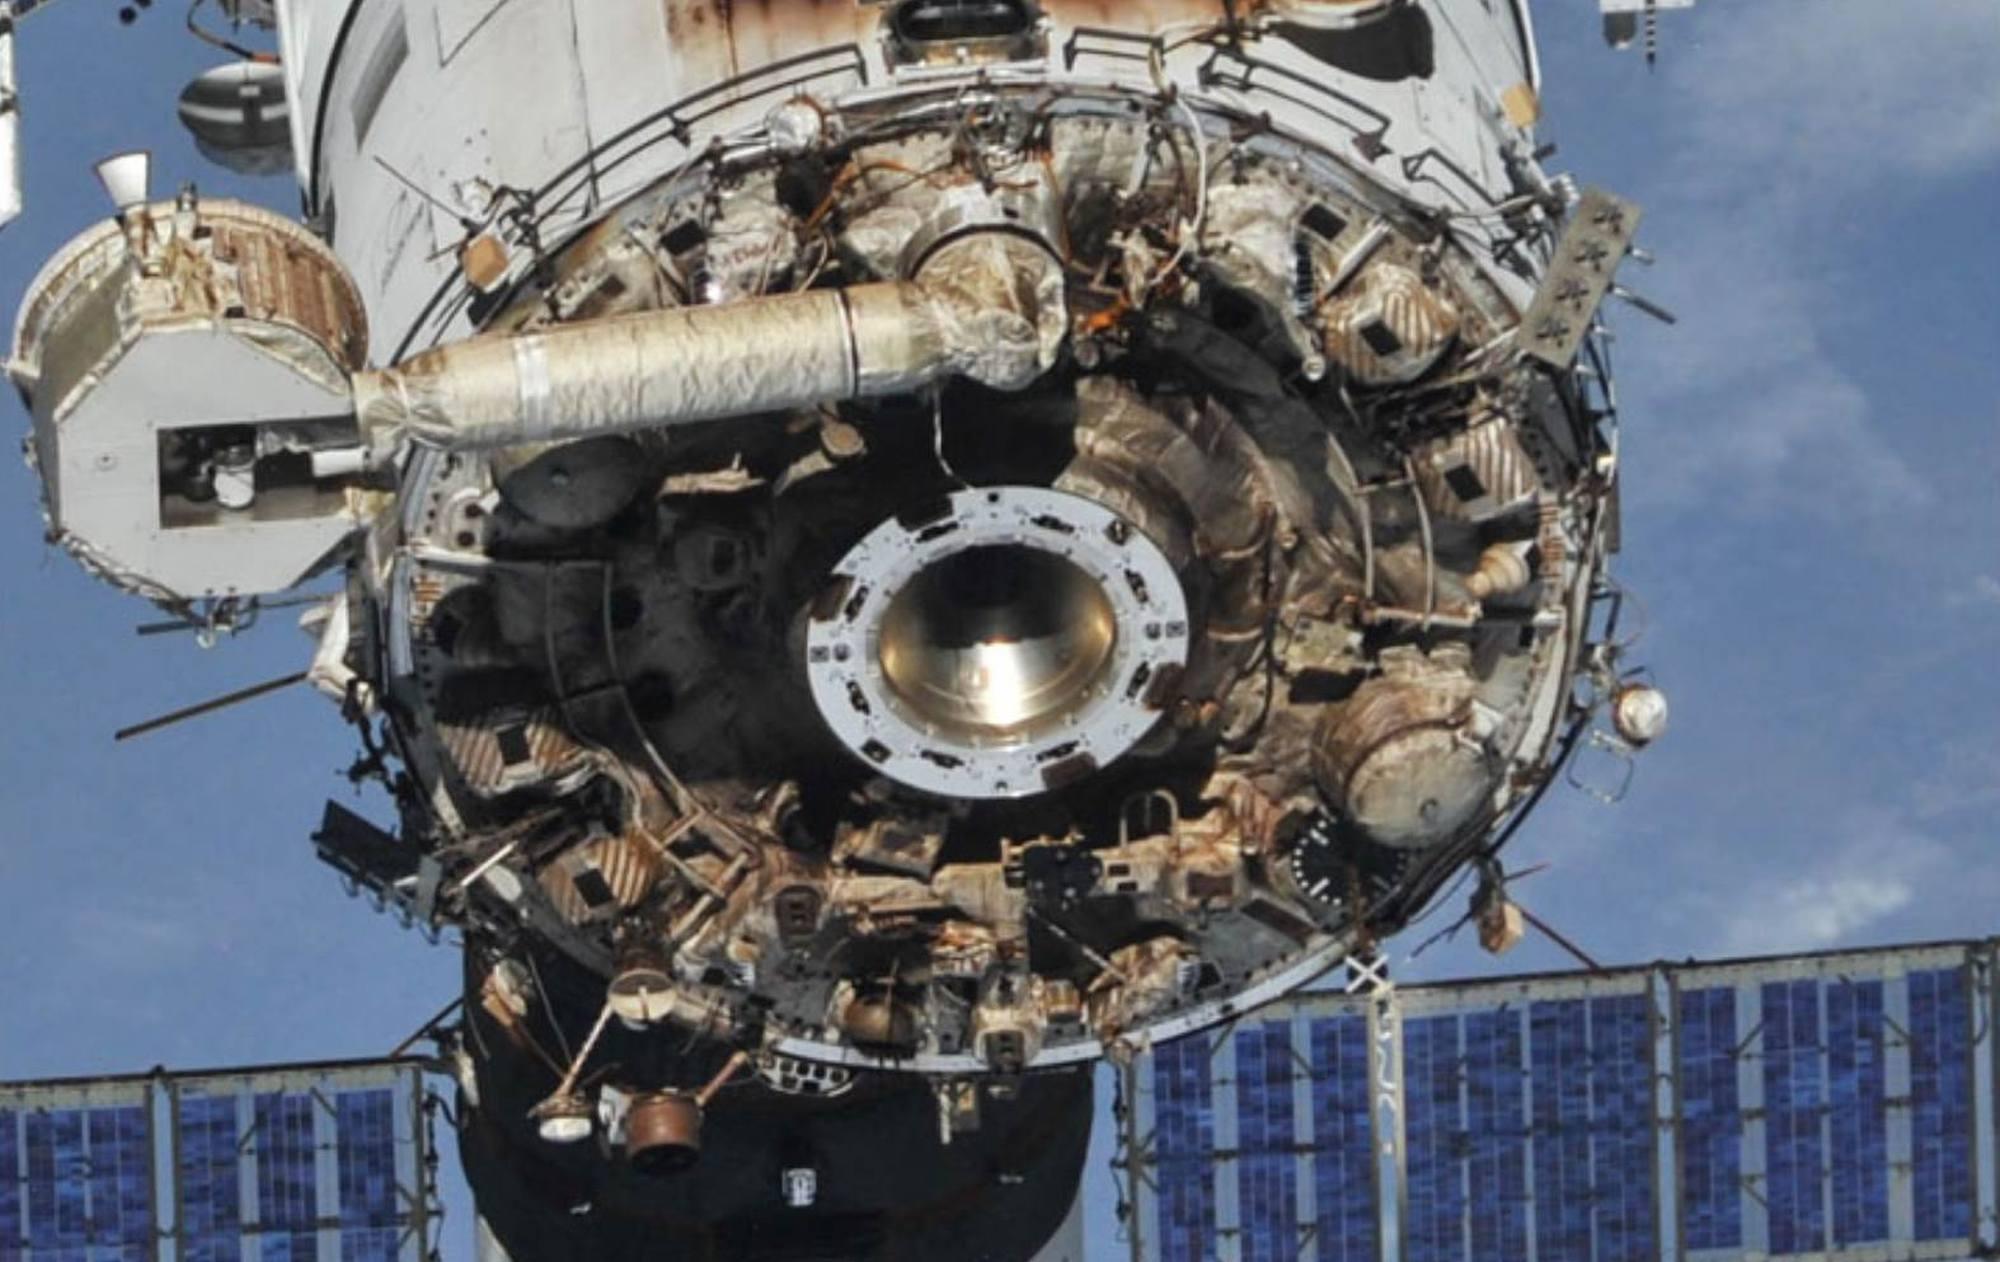 L'arrière du module Zvezda se l'ISS.